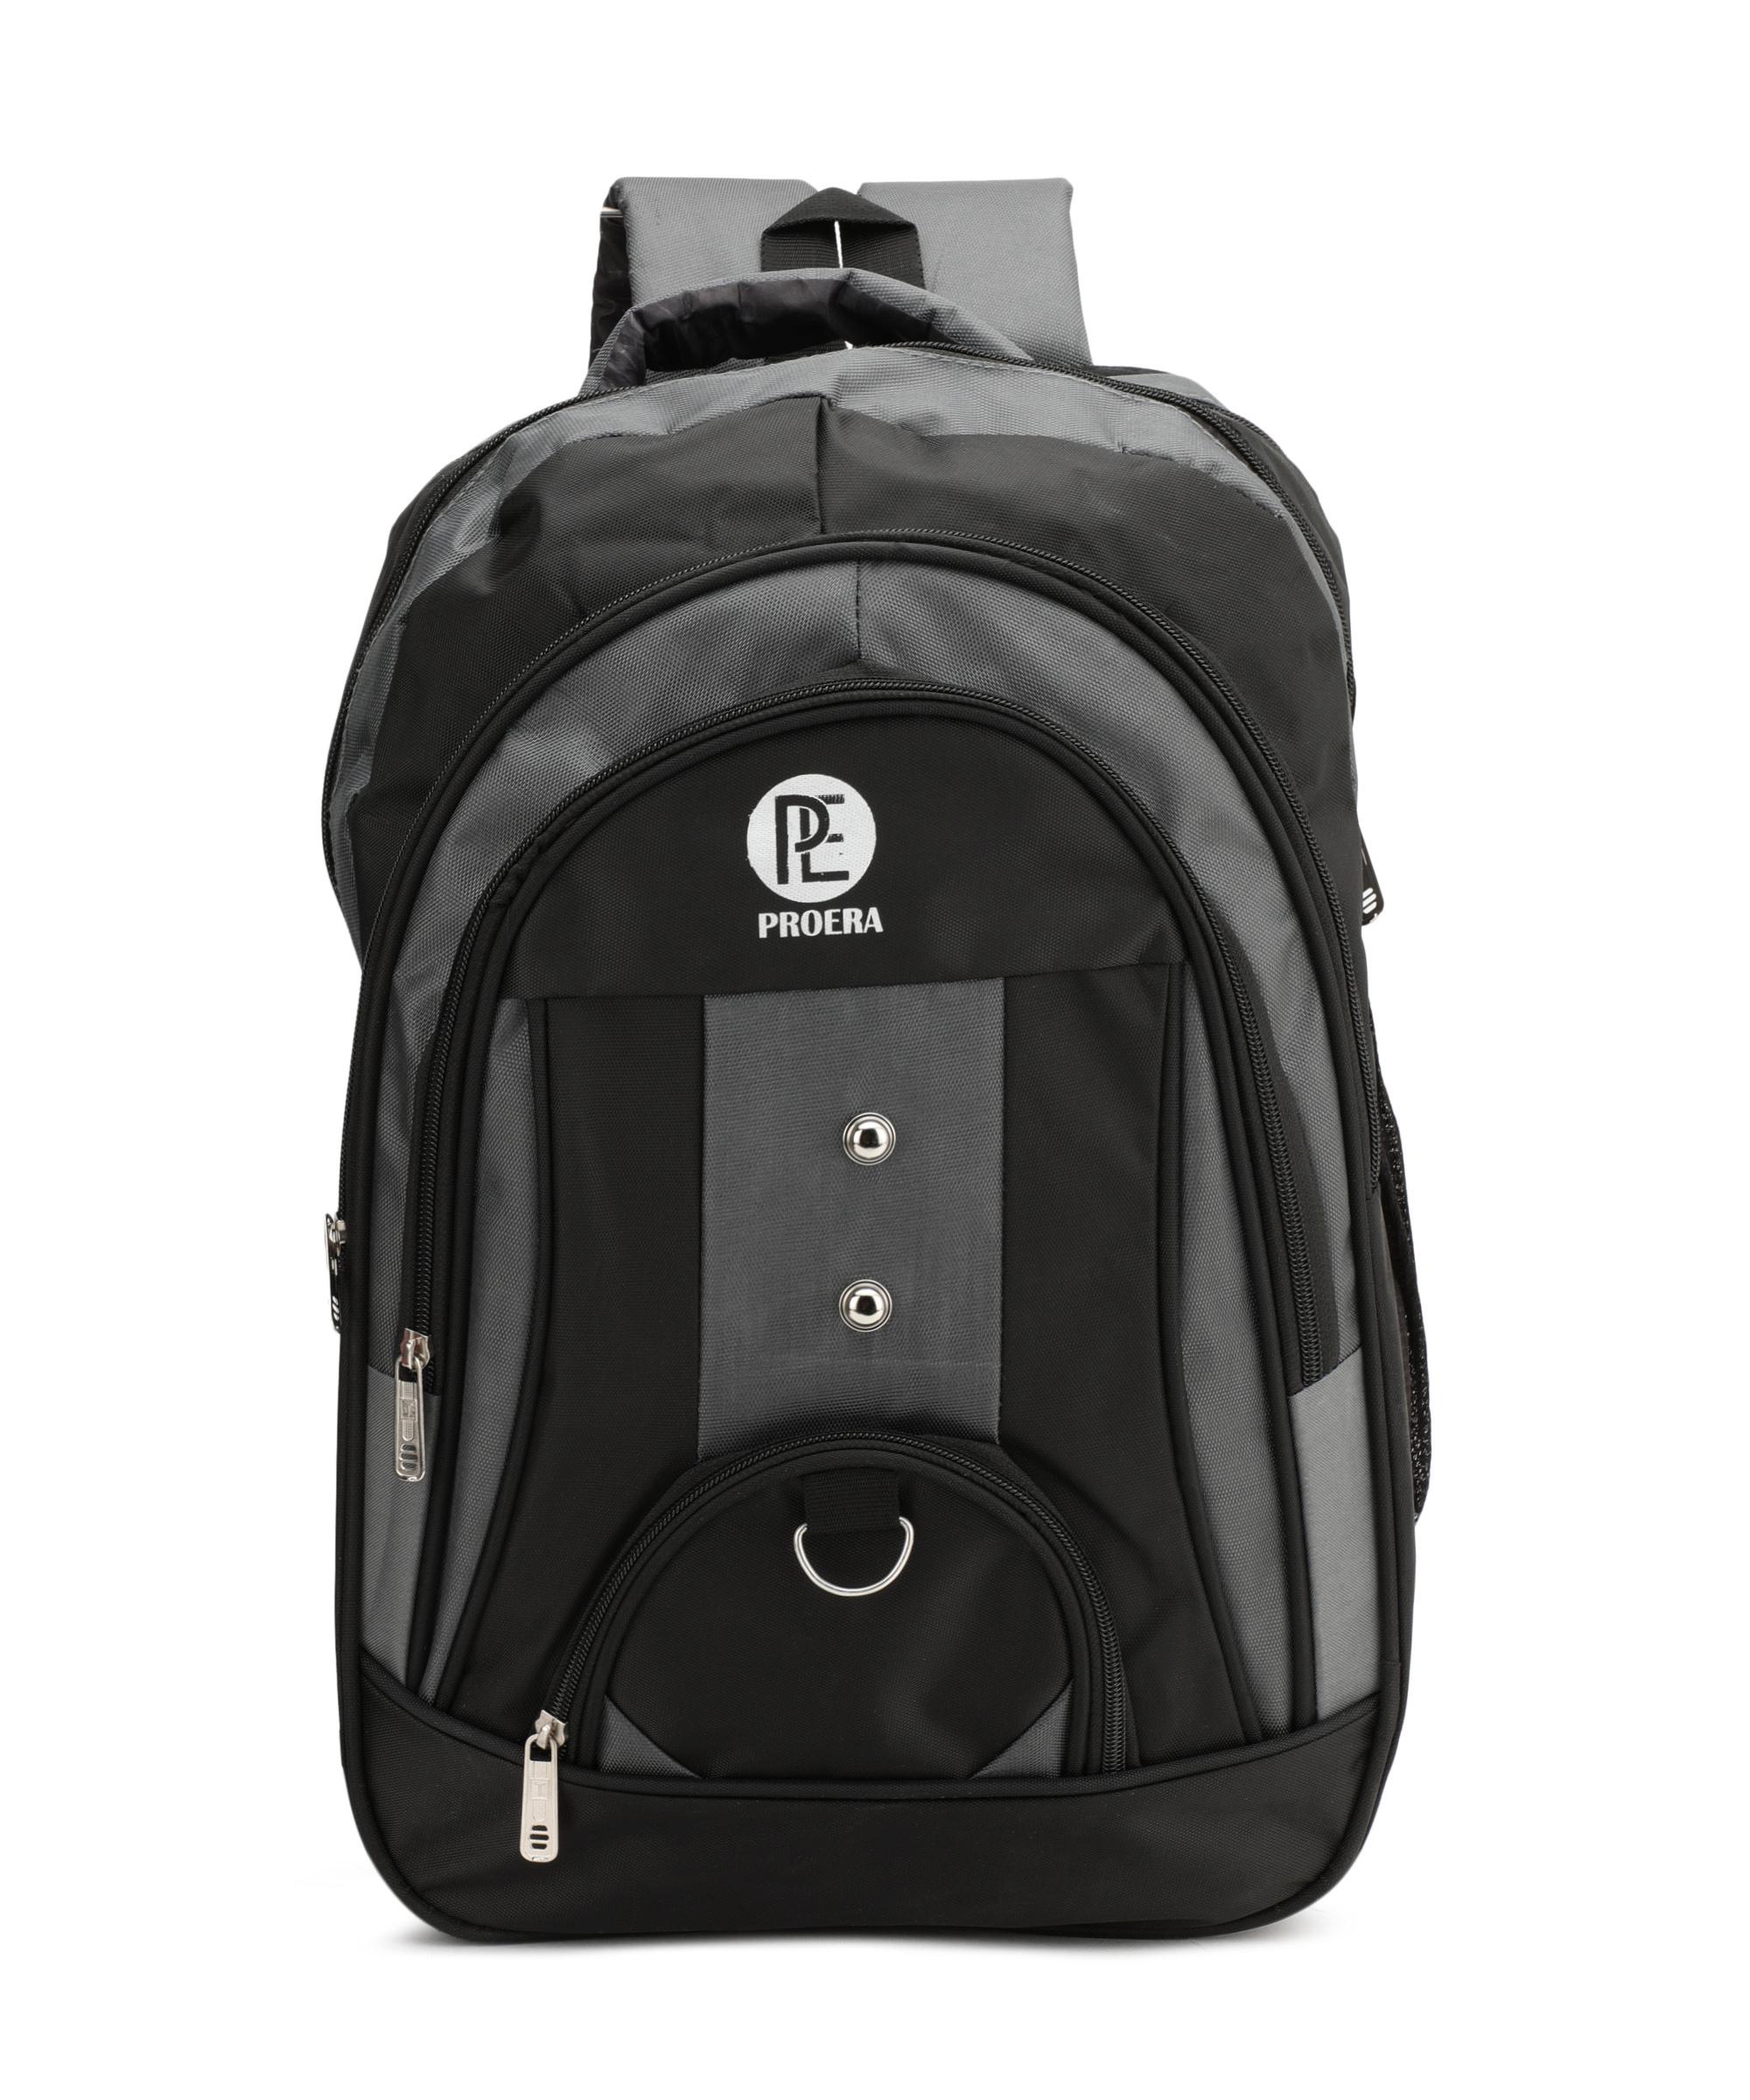 Proera Grey 30 Ltrs Waterproof Polyester School/College   Office Bag  Unisex